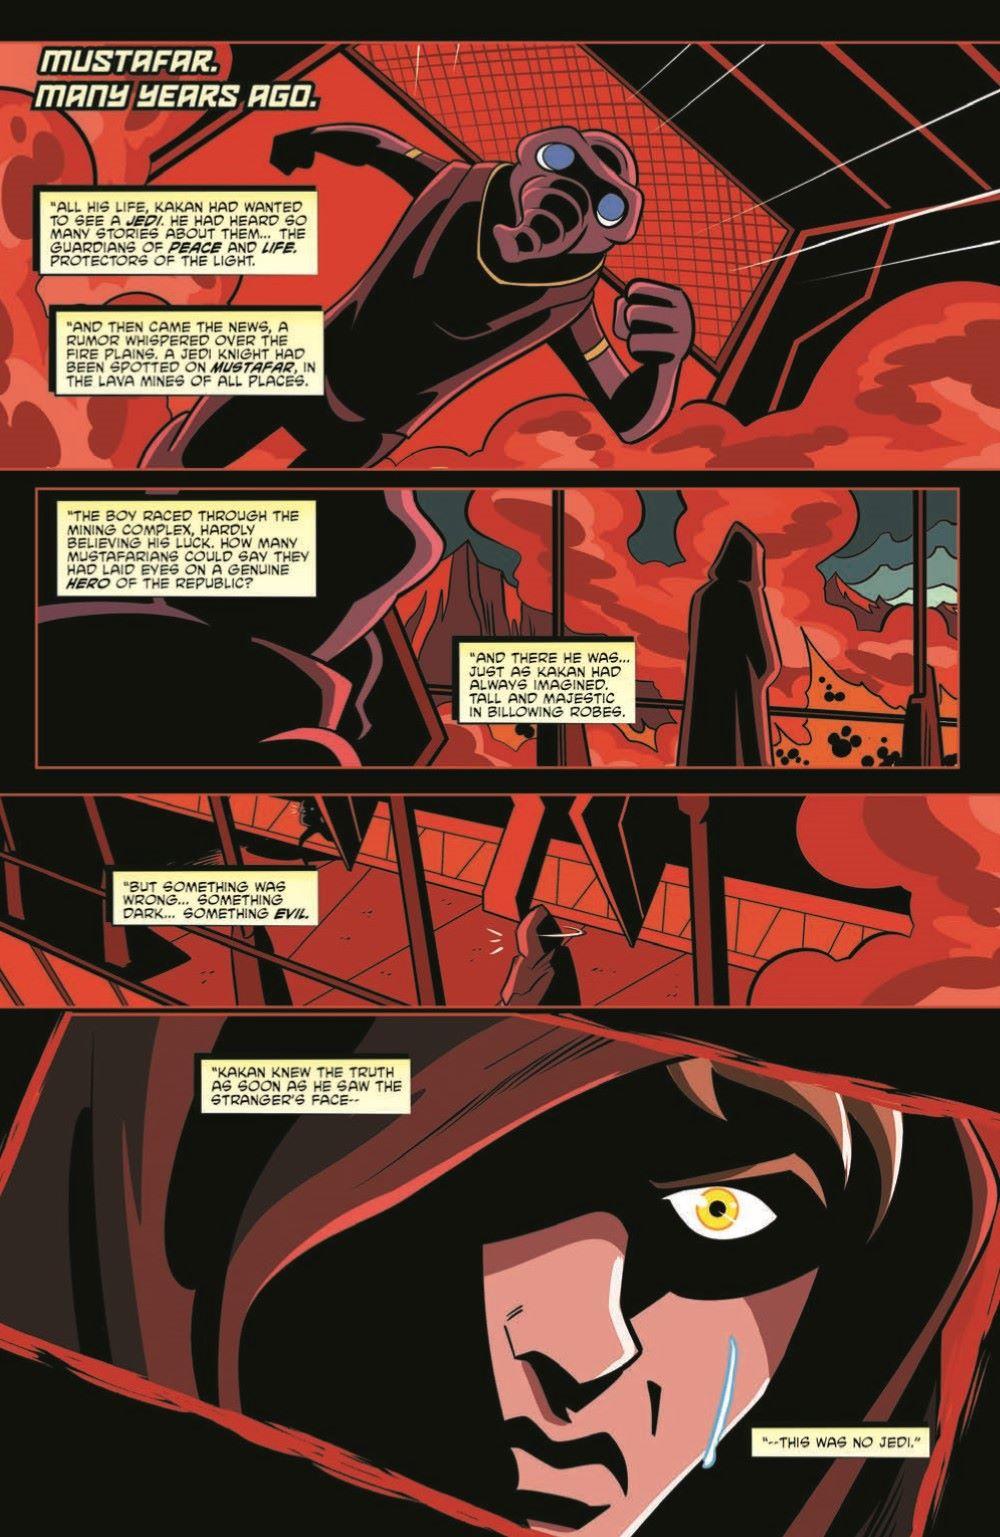 SW_ShadowOfVadersCastle_01-pr-3 ComicList Previews: STAR WARS ADVENTURES SHADOW OF VADER'S CASTLE #1